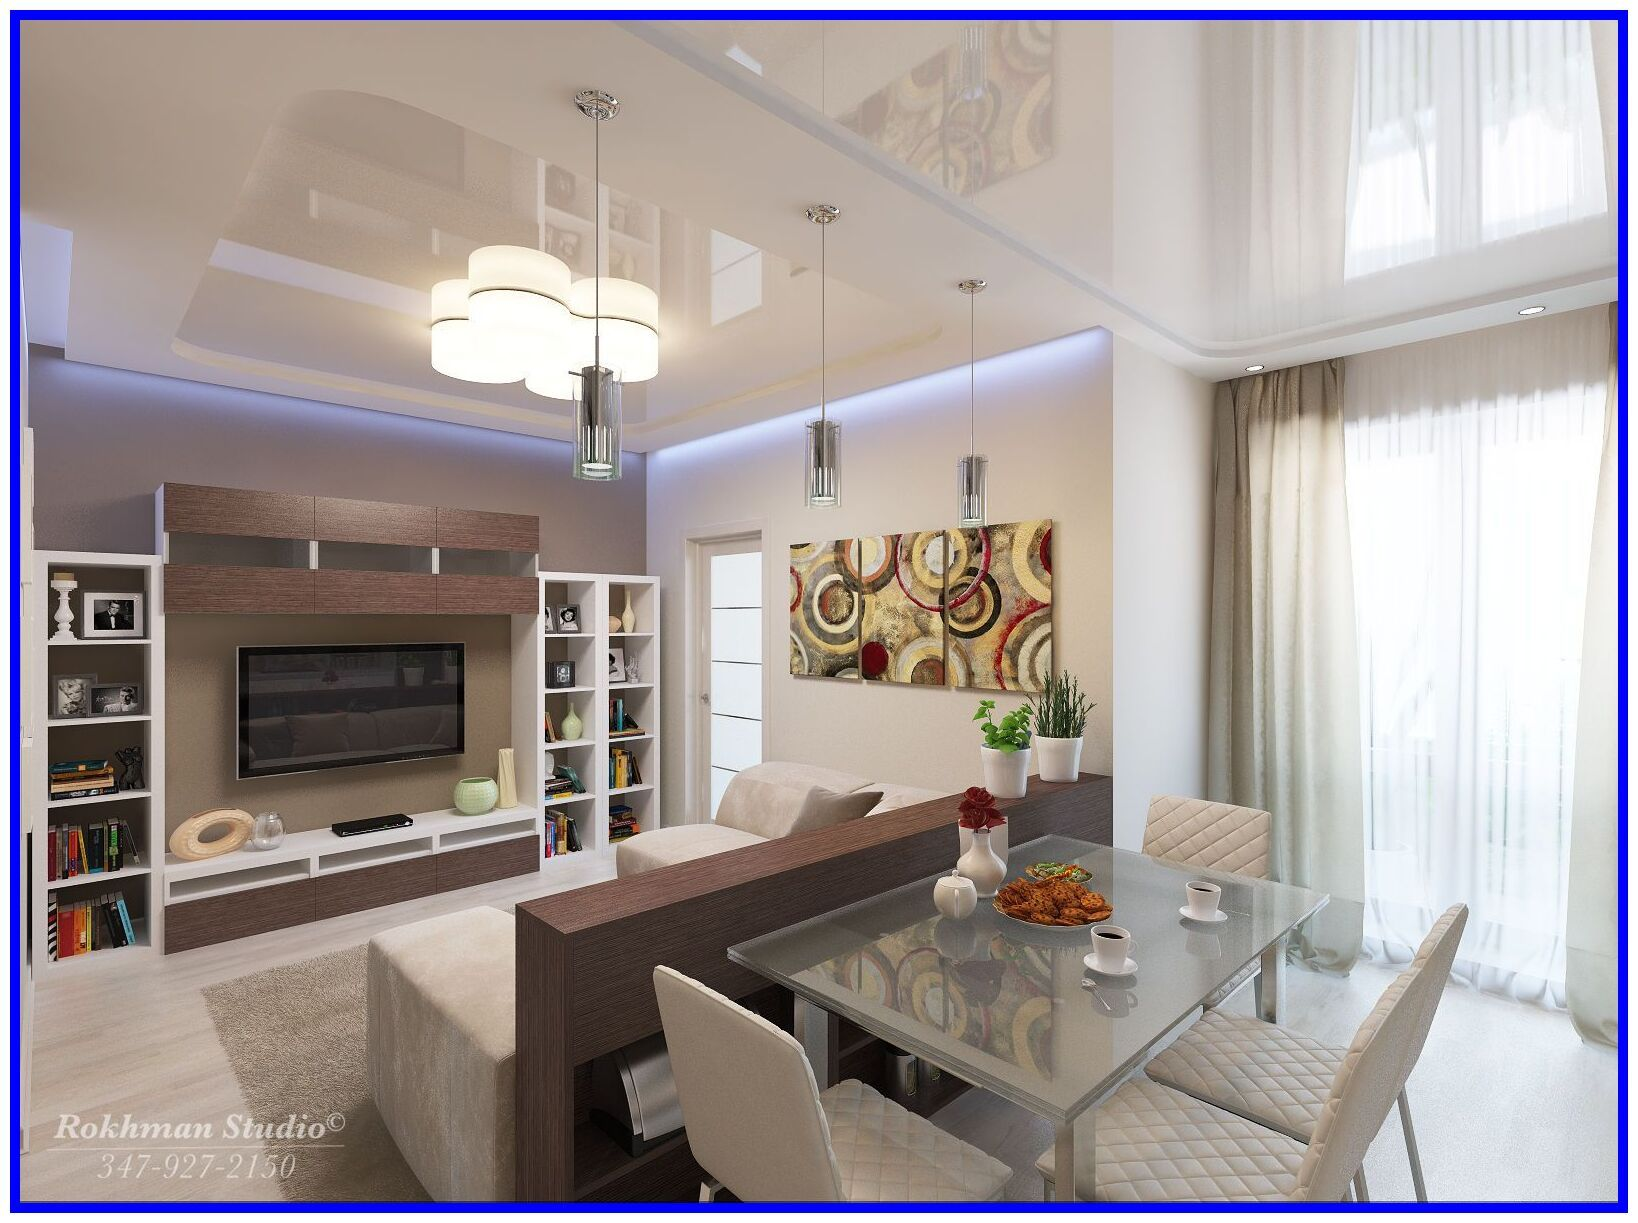 Pin On Dorm Room Decor Minimalist Simple #townhouse #living #room #dining #room #combo